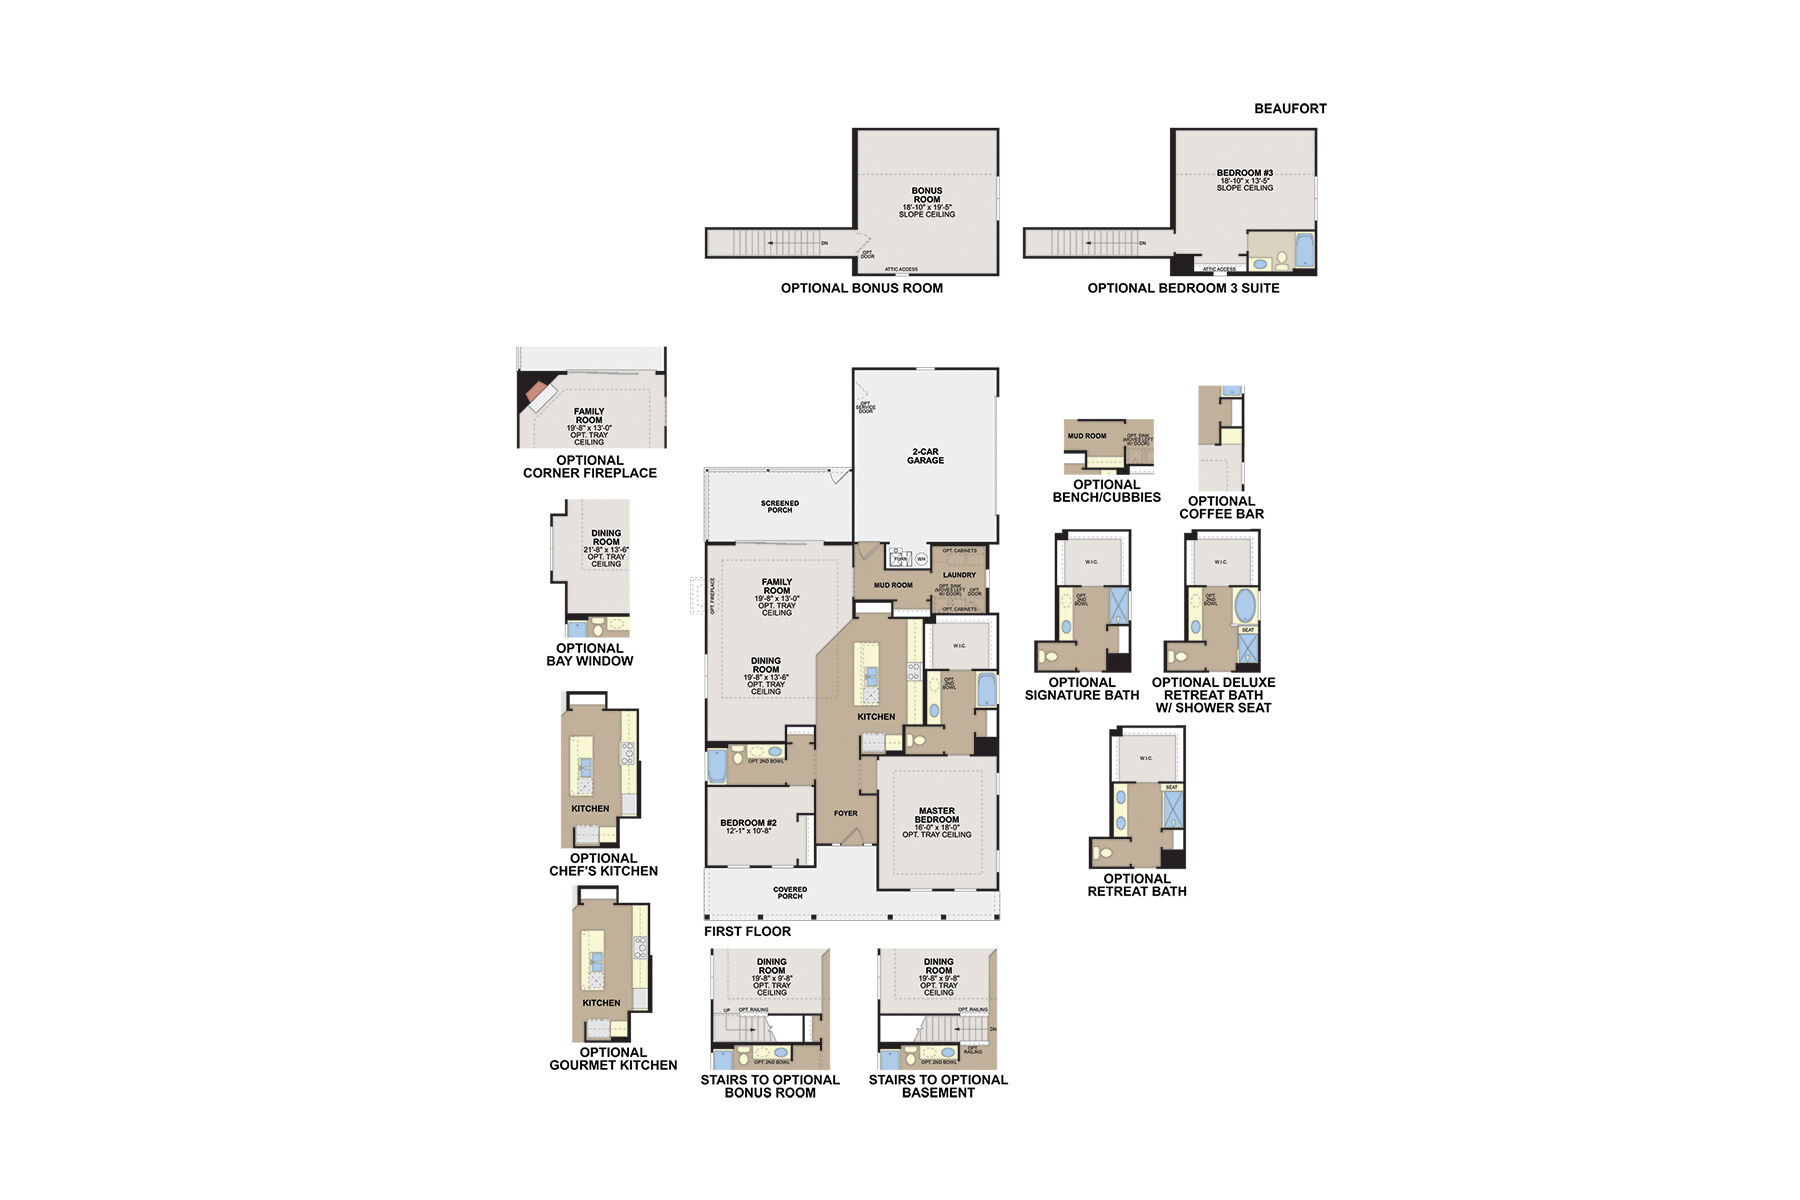 Beaufort First Floor